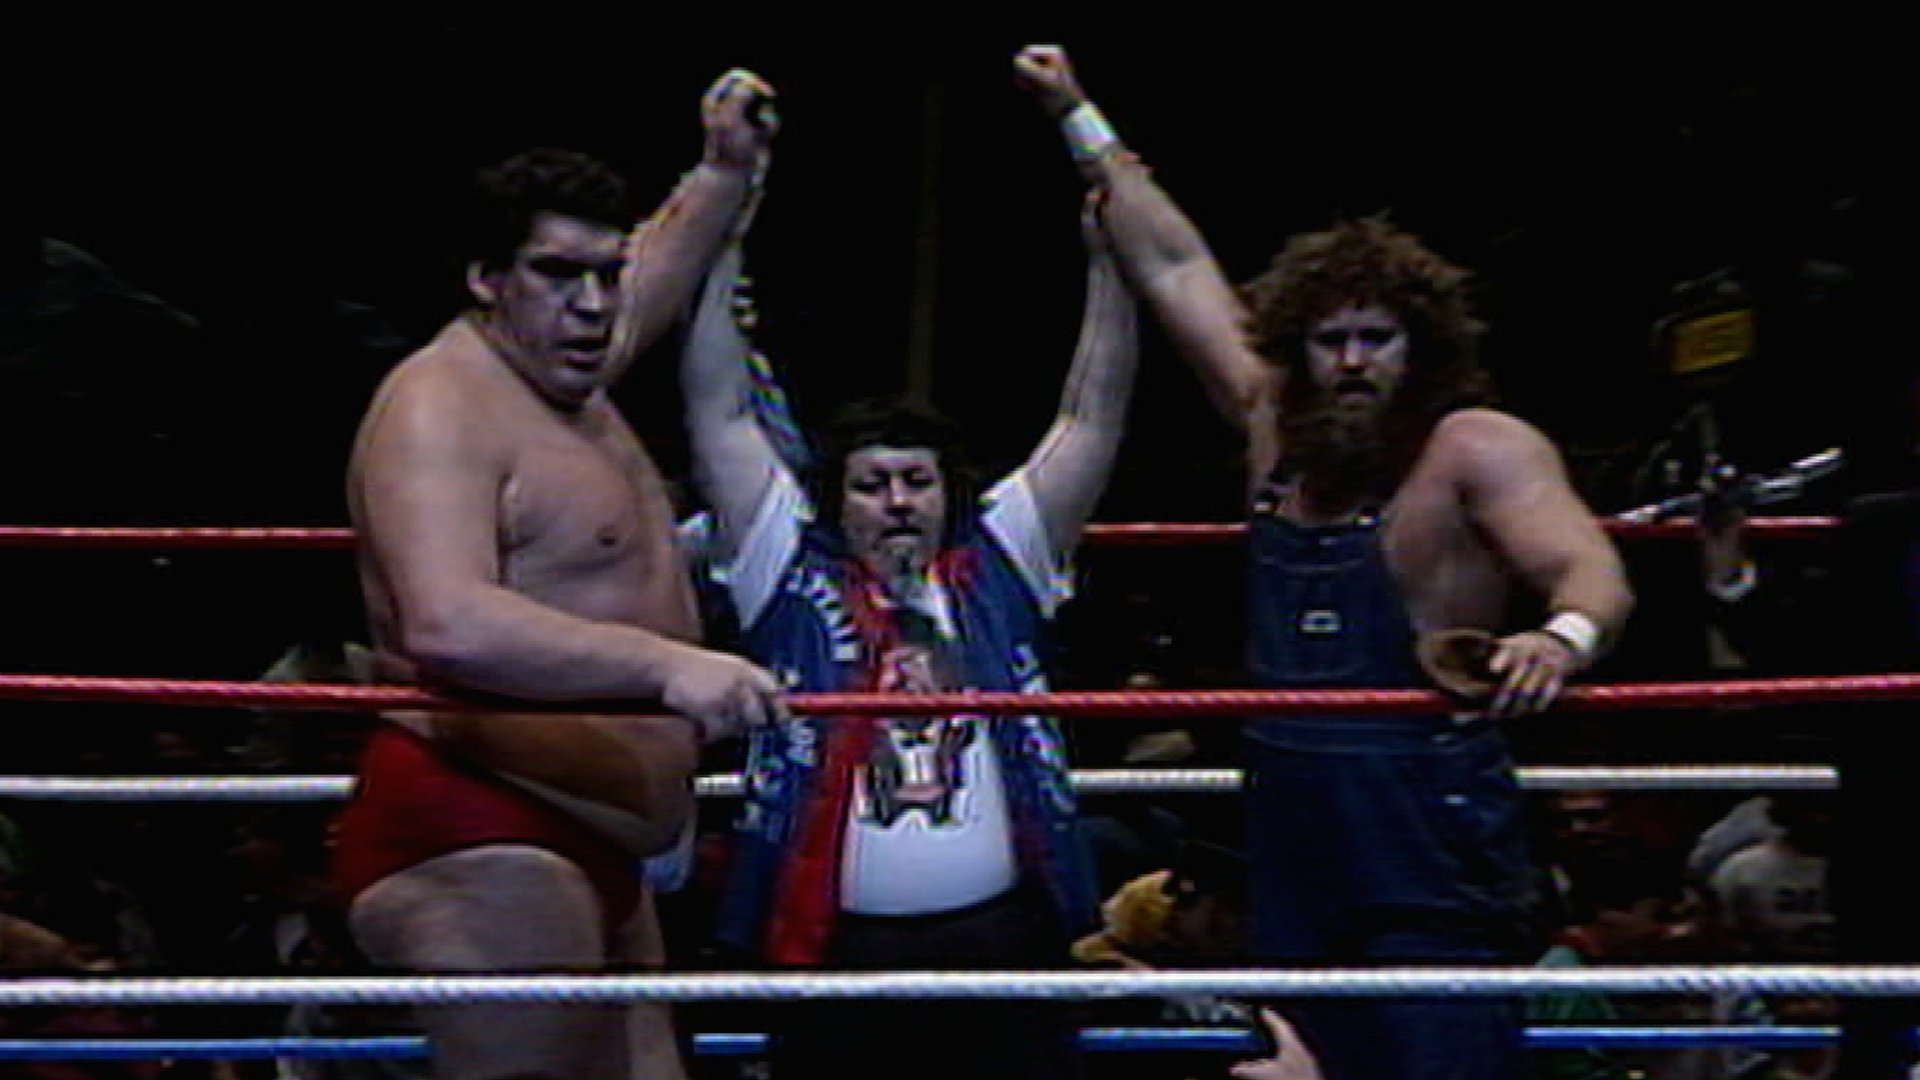 Hillbilly Jim, Andre the Giant & Captain Lou Albano vs. Big John Studd, King Kong Bundy & Bobby Heenan: Madison Square Garden, 25 Novembre 1985